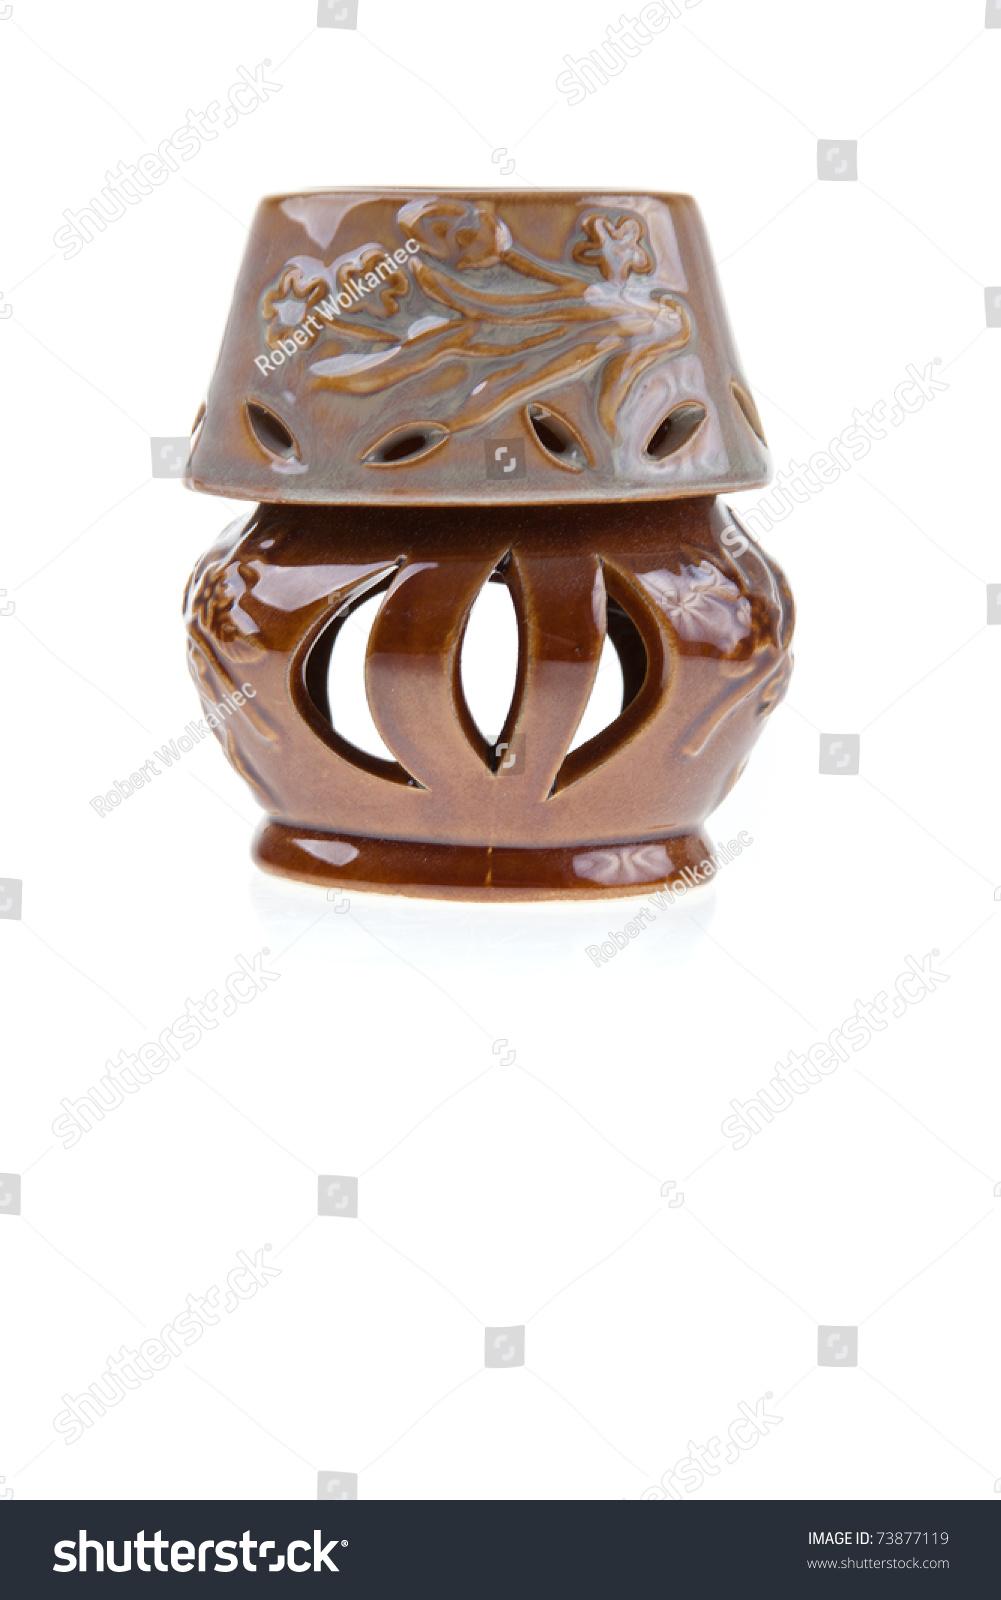 Fireplace Fragrance, Fragrance Oil Lamp Stock Photo 73877119 ...